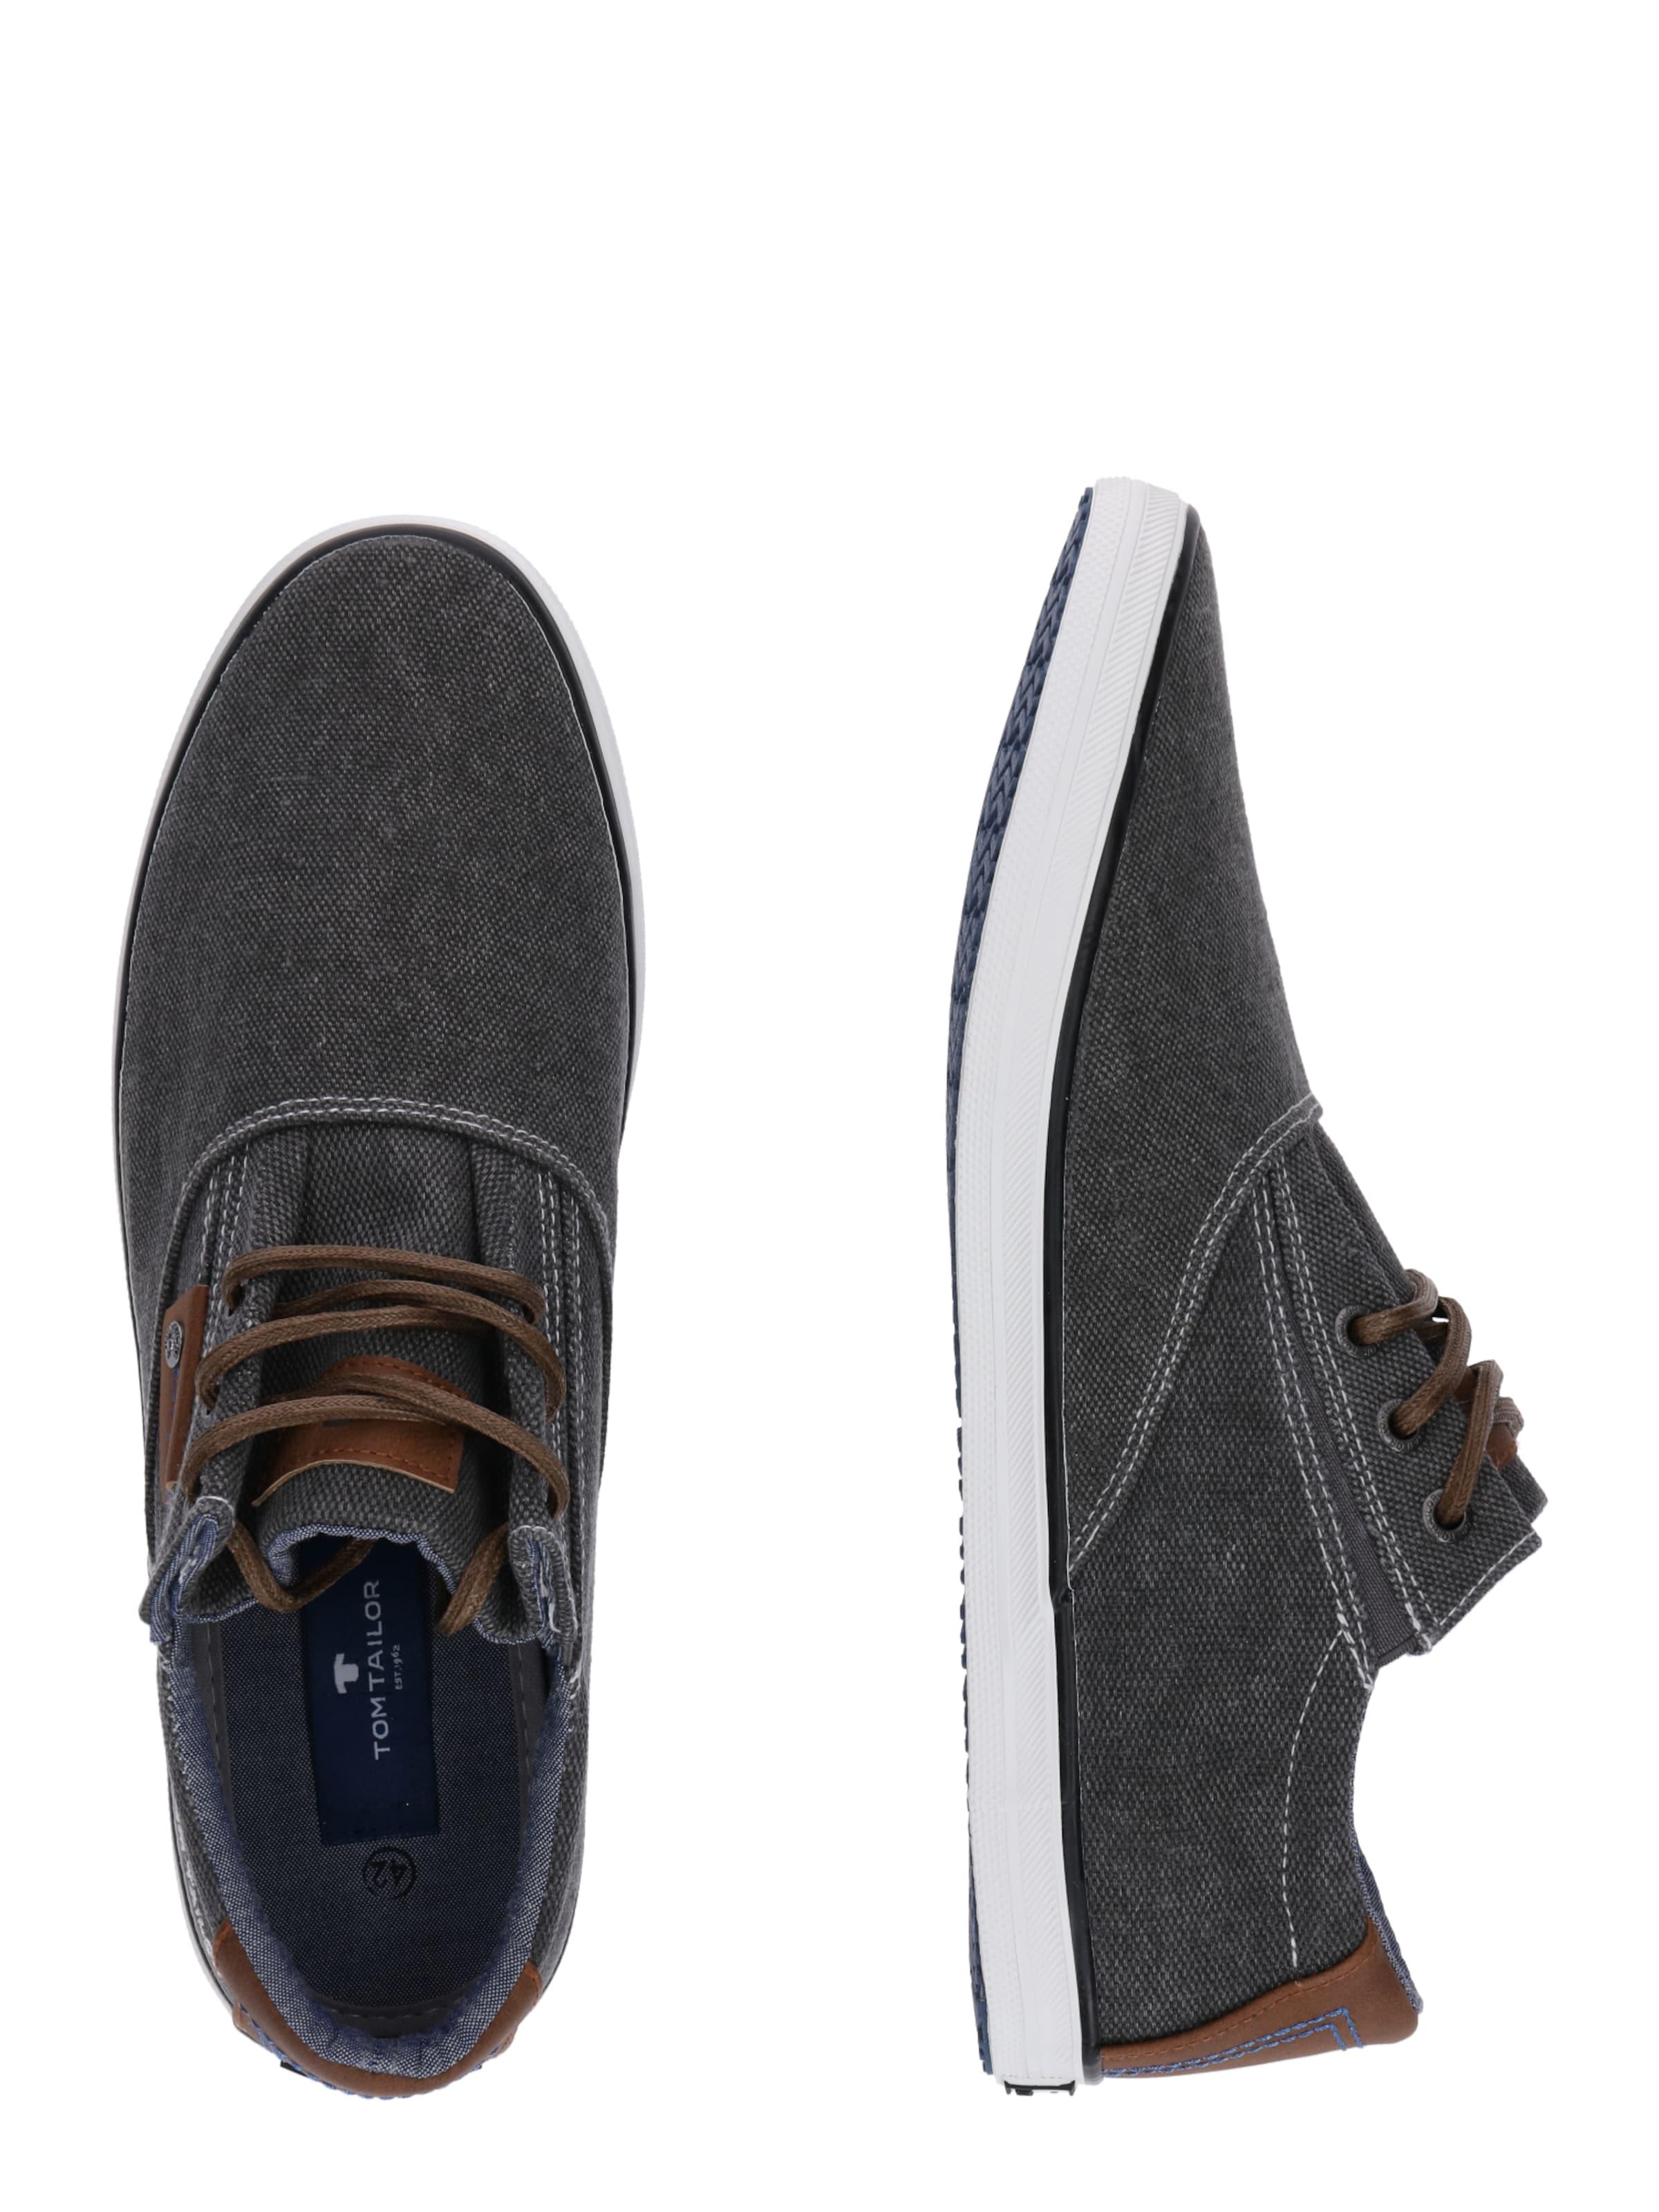 Tailor Sneaker Dunkelgrau In Dunkelgrau Sneaker In Tom In Tailor Tom Tom Tailor Sneaker wNm8n0